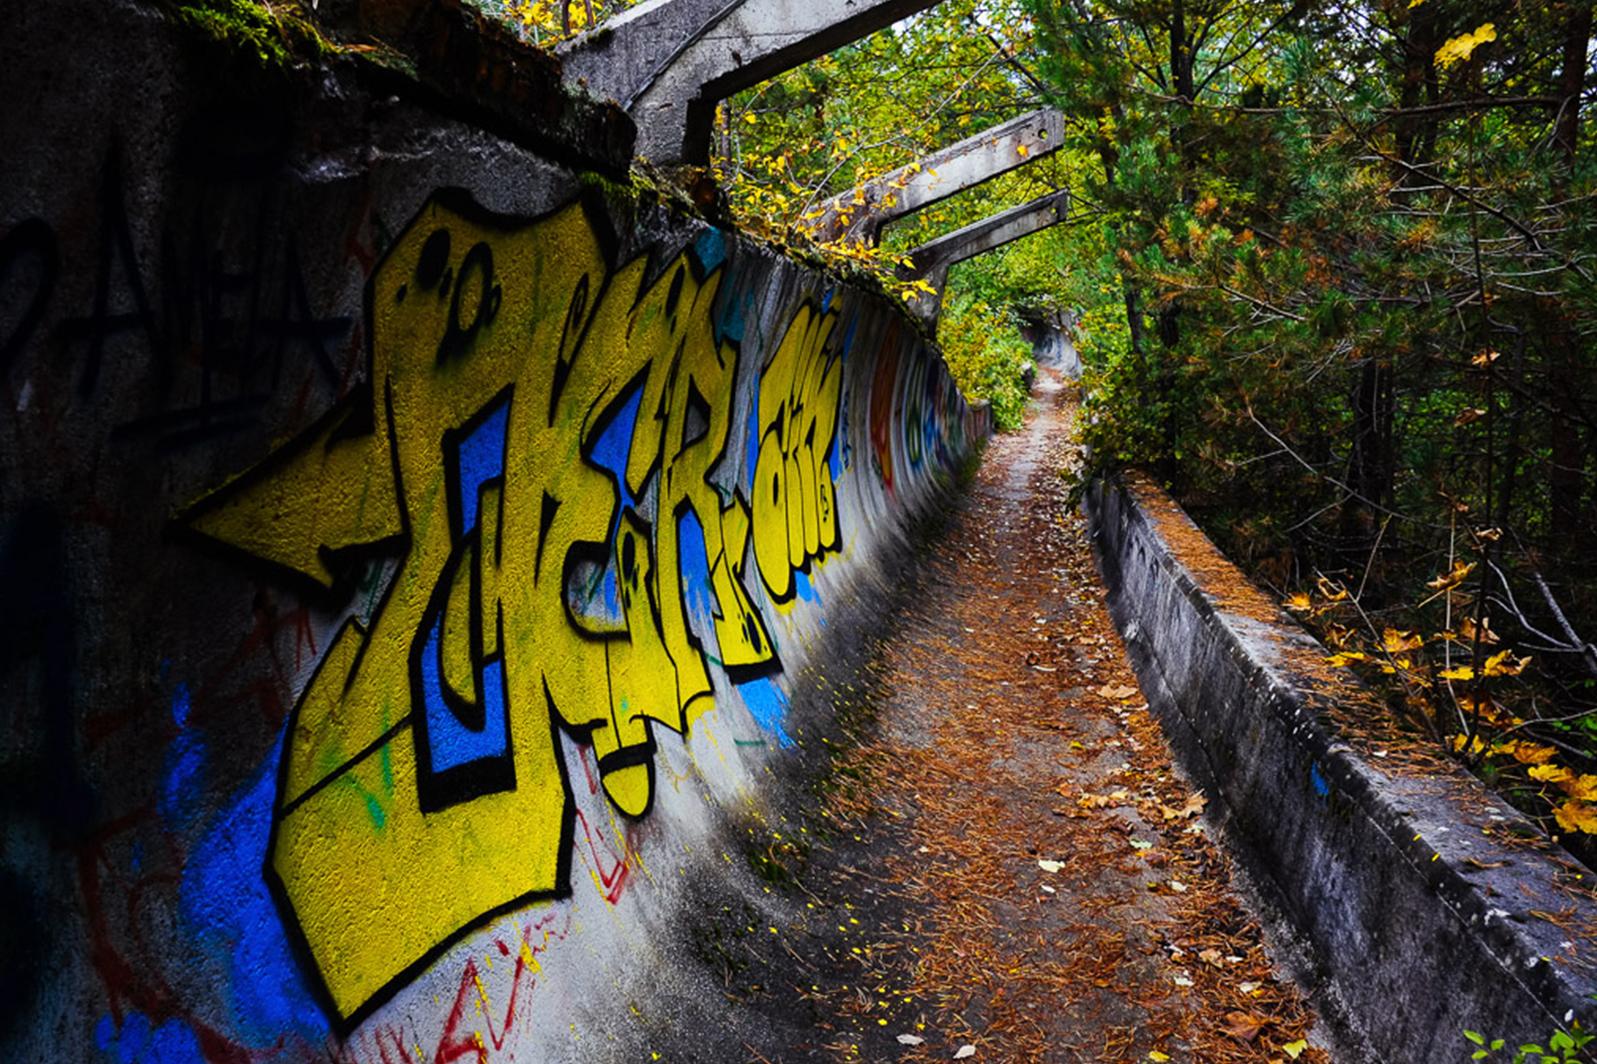 urbex sarajevo jo bobsleigh piste - Berlin, Sarajevo, Athènes : les sites des Jeux Olympiques version urbex